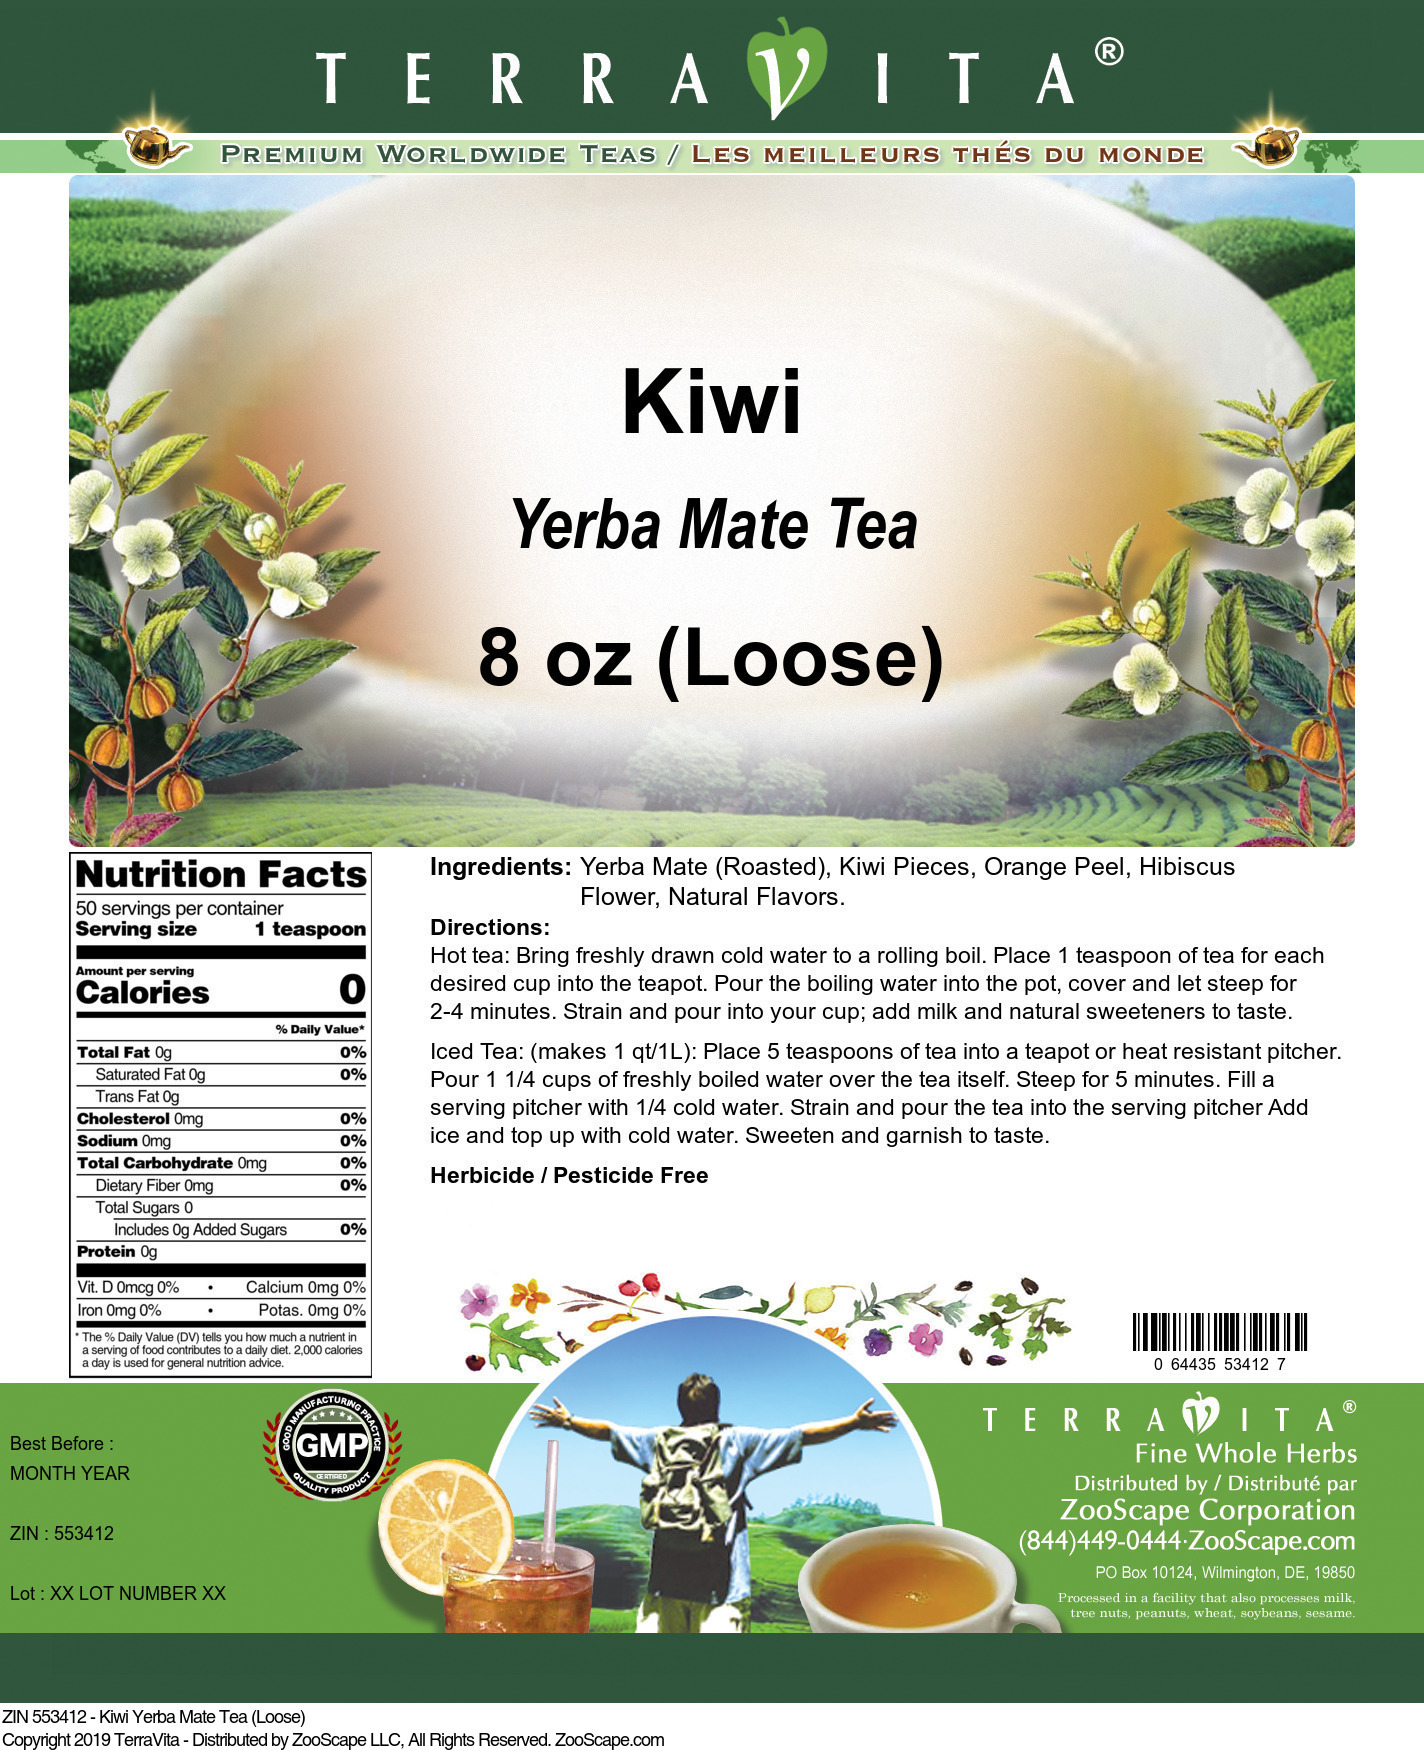 Kiwi Yerba Mate